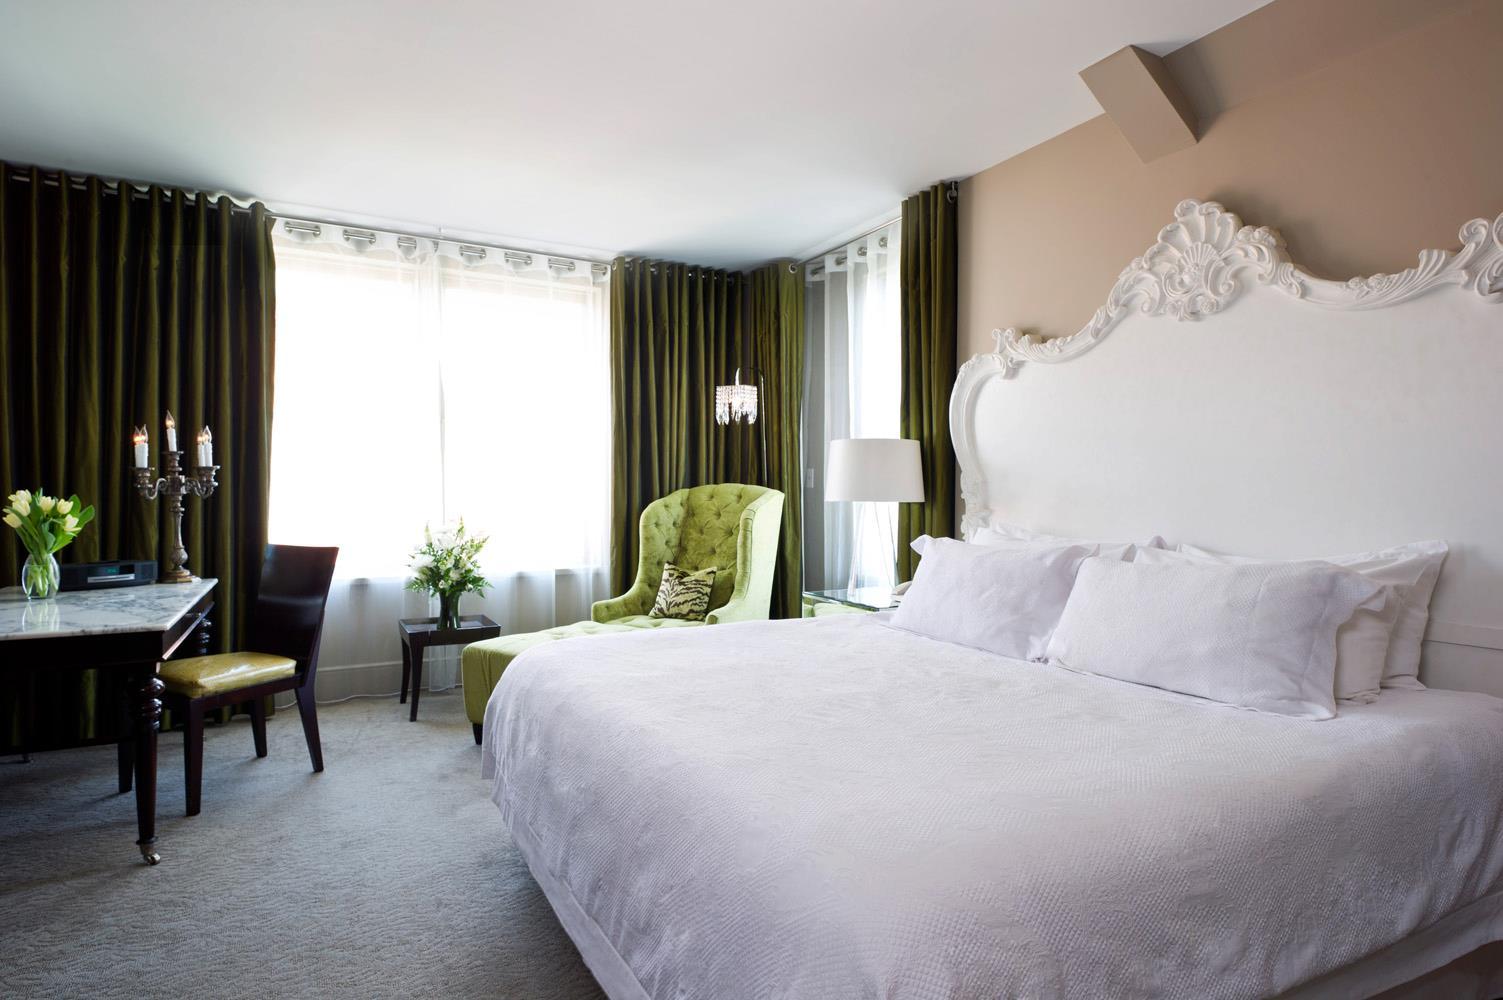 Romantic Hotels Mansion on Forsyth Savannah Georgia